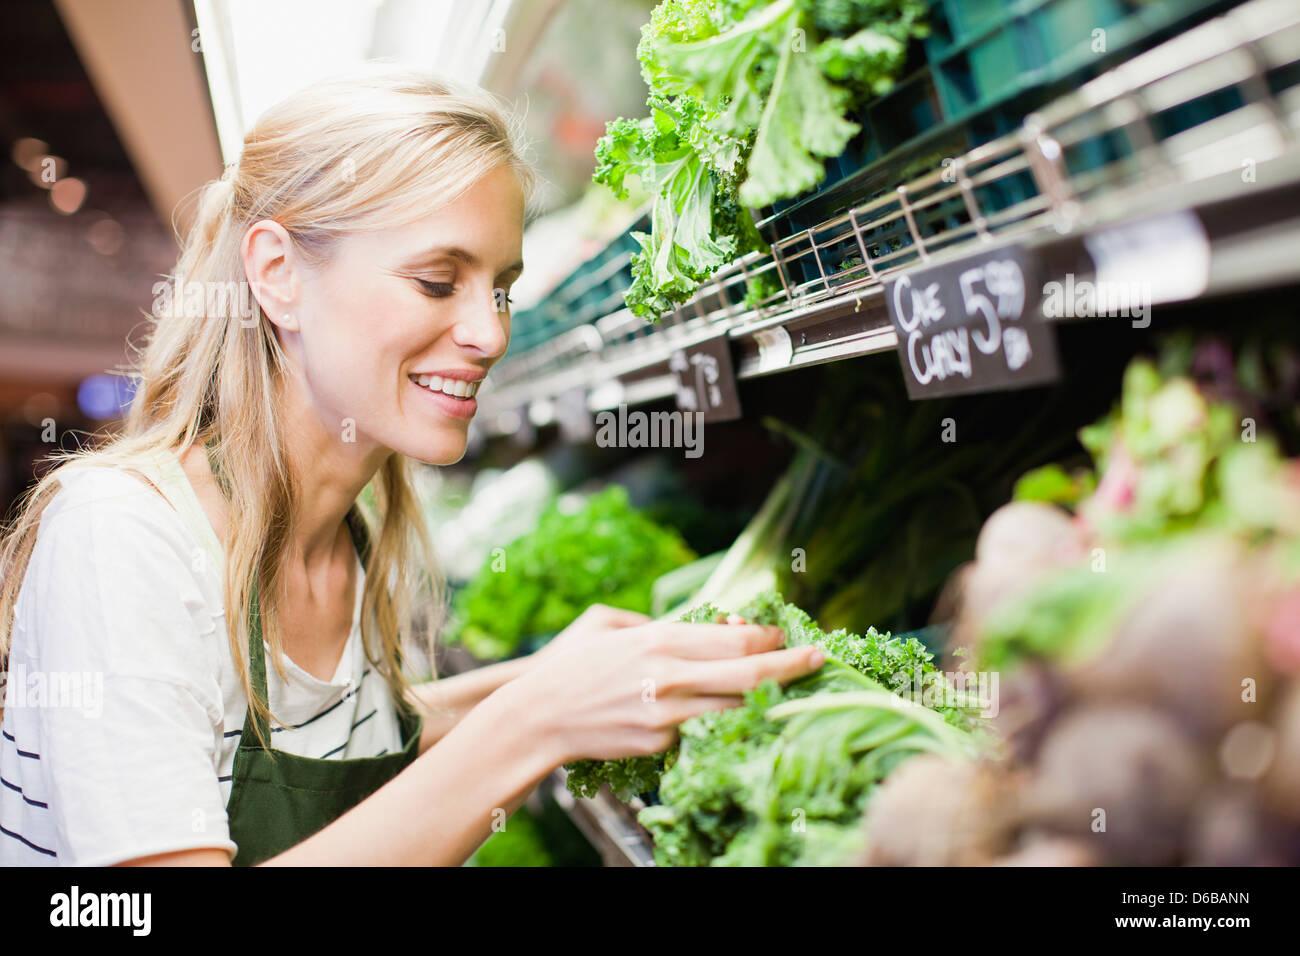 Lebensmittelhändler in arbeiten produzieren Abschnitt Stockbild